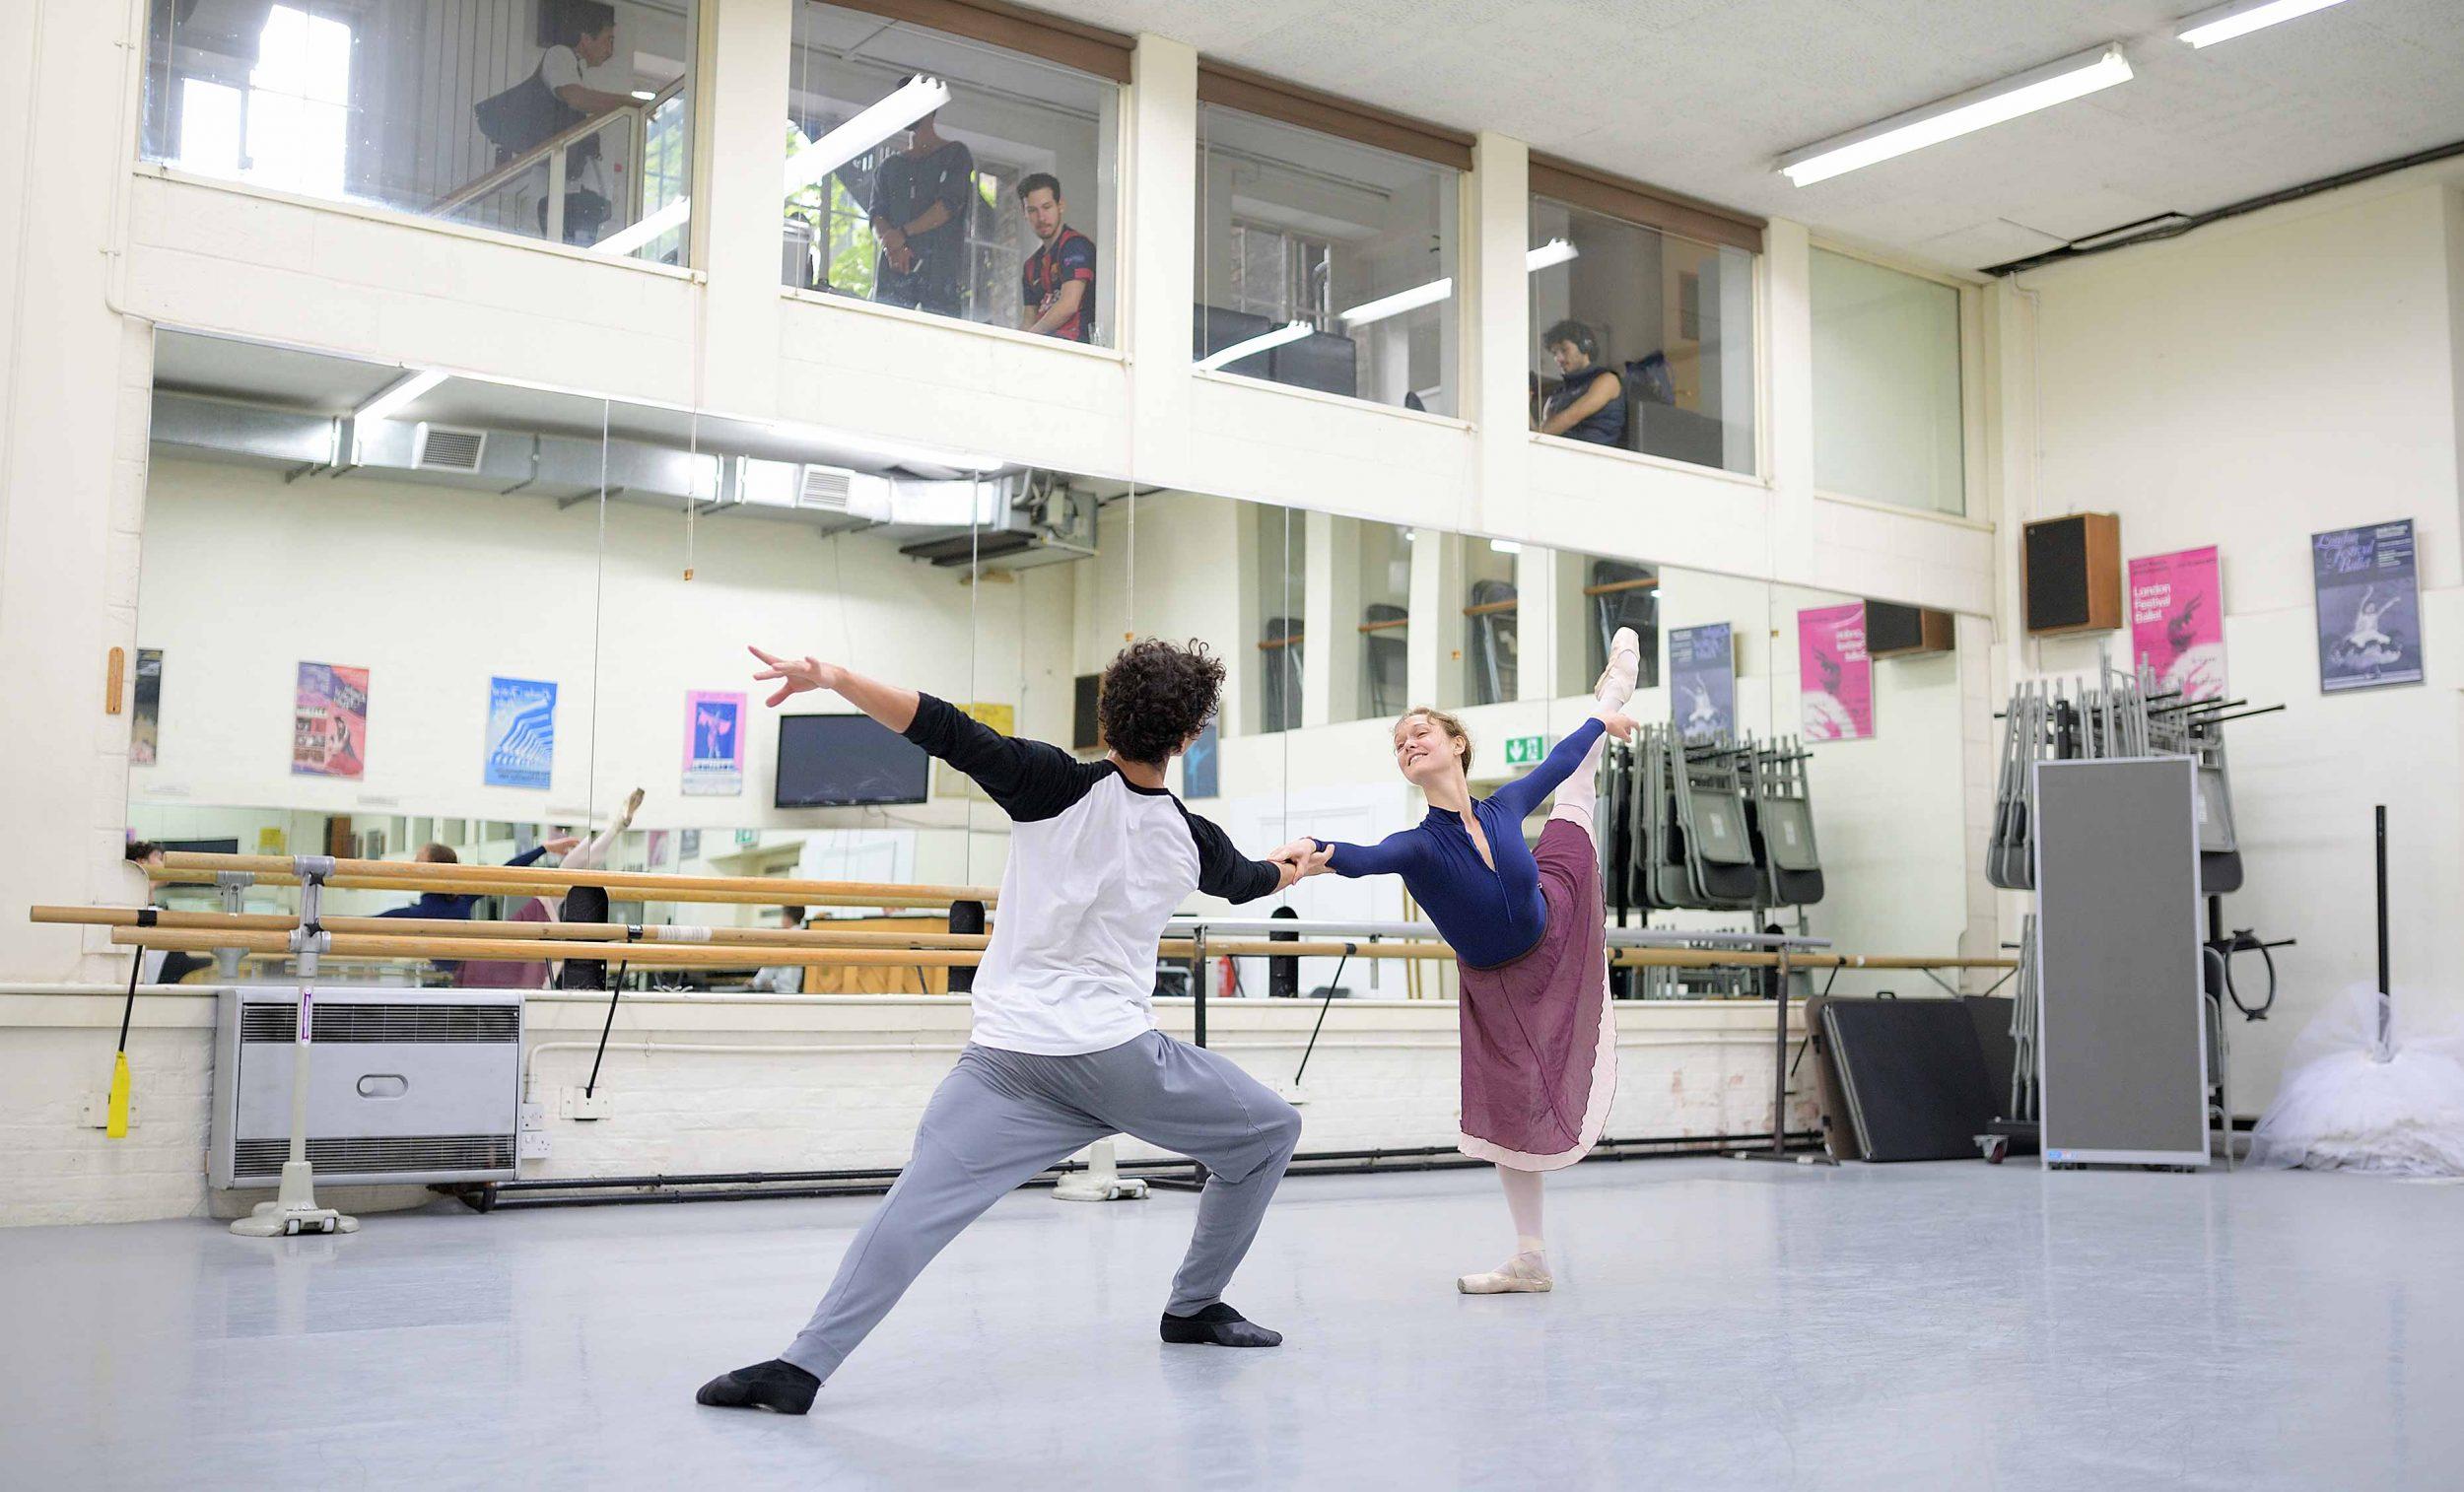 Isaac-Hernandez-and-Jurgita-Dronina-in-rehearsals-for-Manon-(c)-Laurent-Liotardo-(3)_WEB